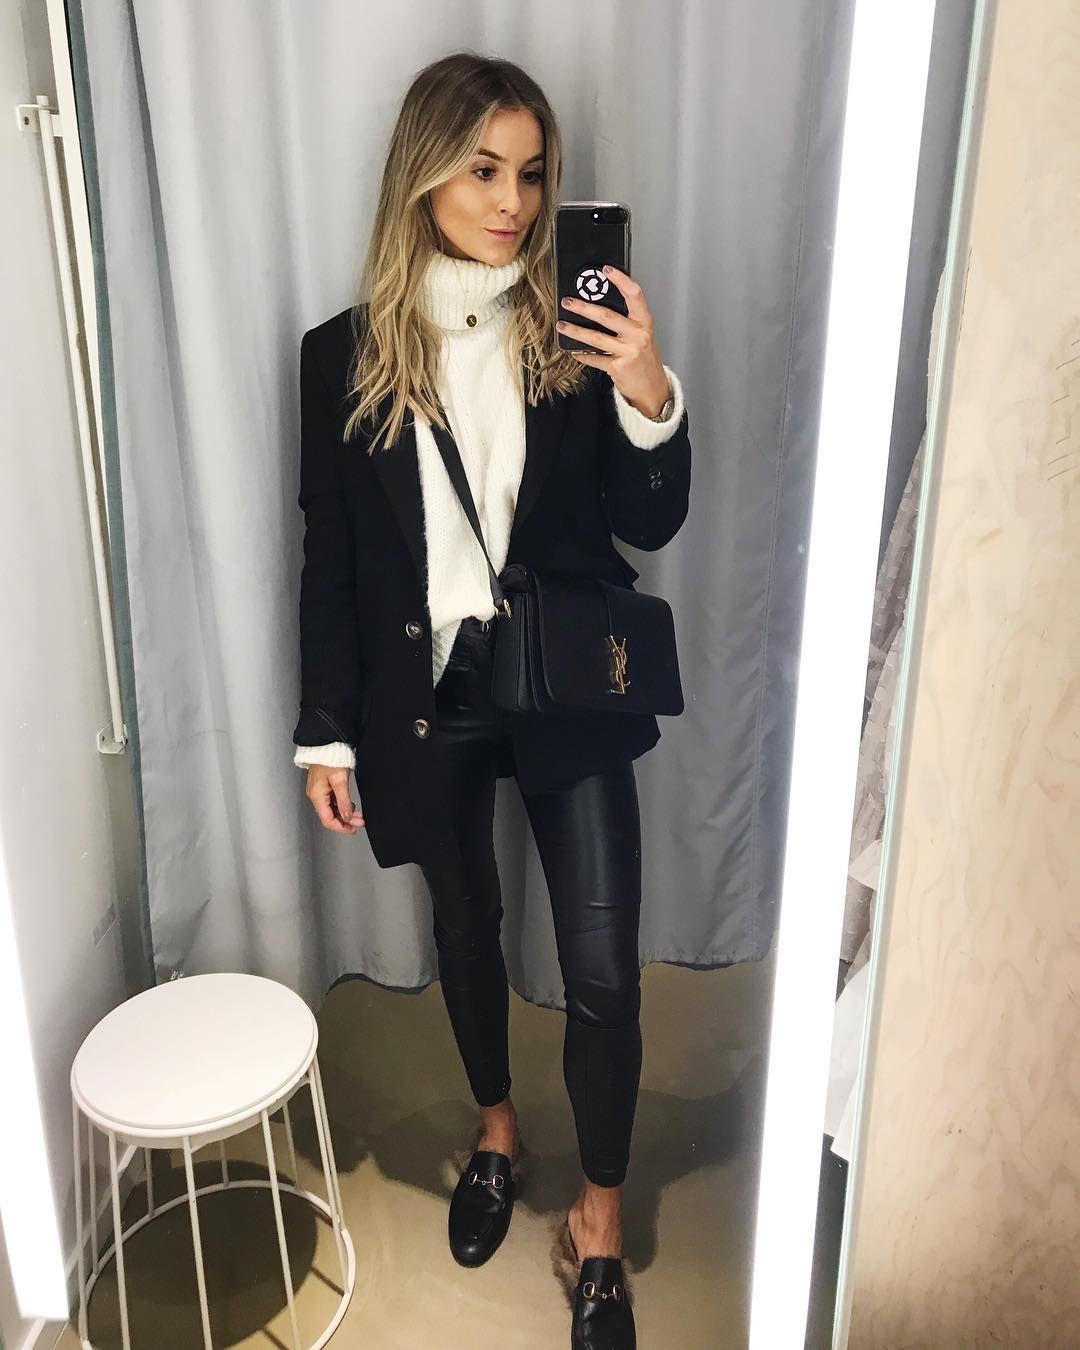 "NADIA ANYA ⚡️ on Instagram: ""Rainy days = changing room selfies"